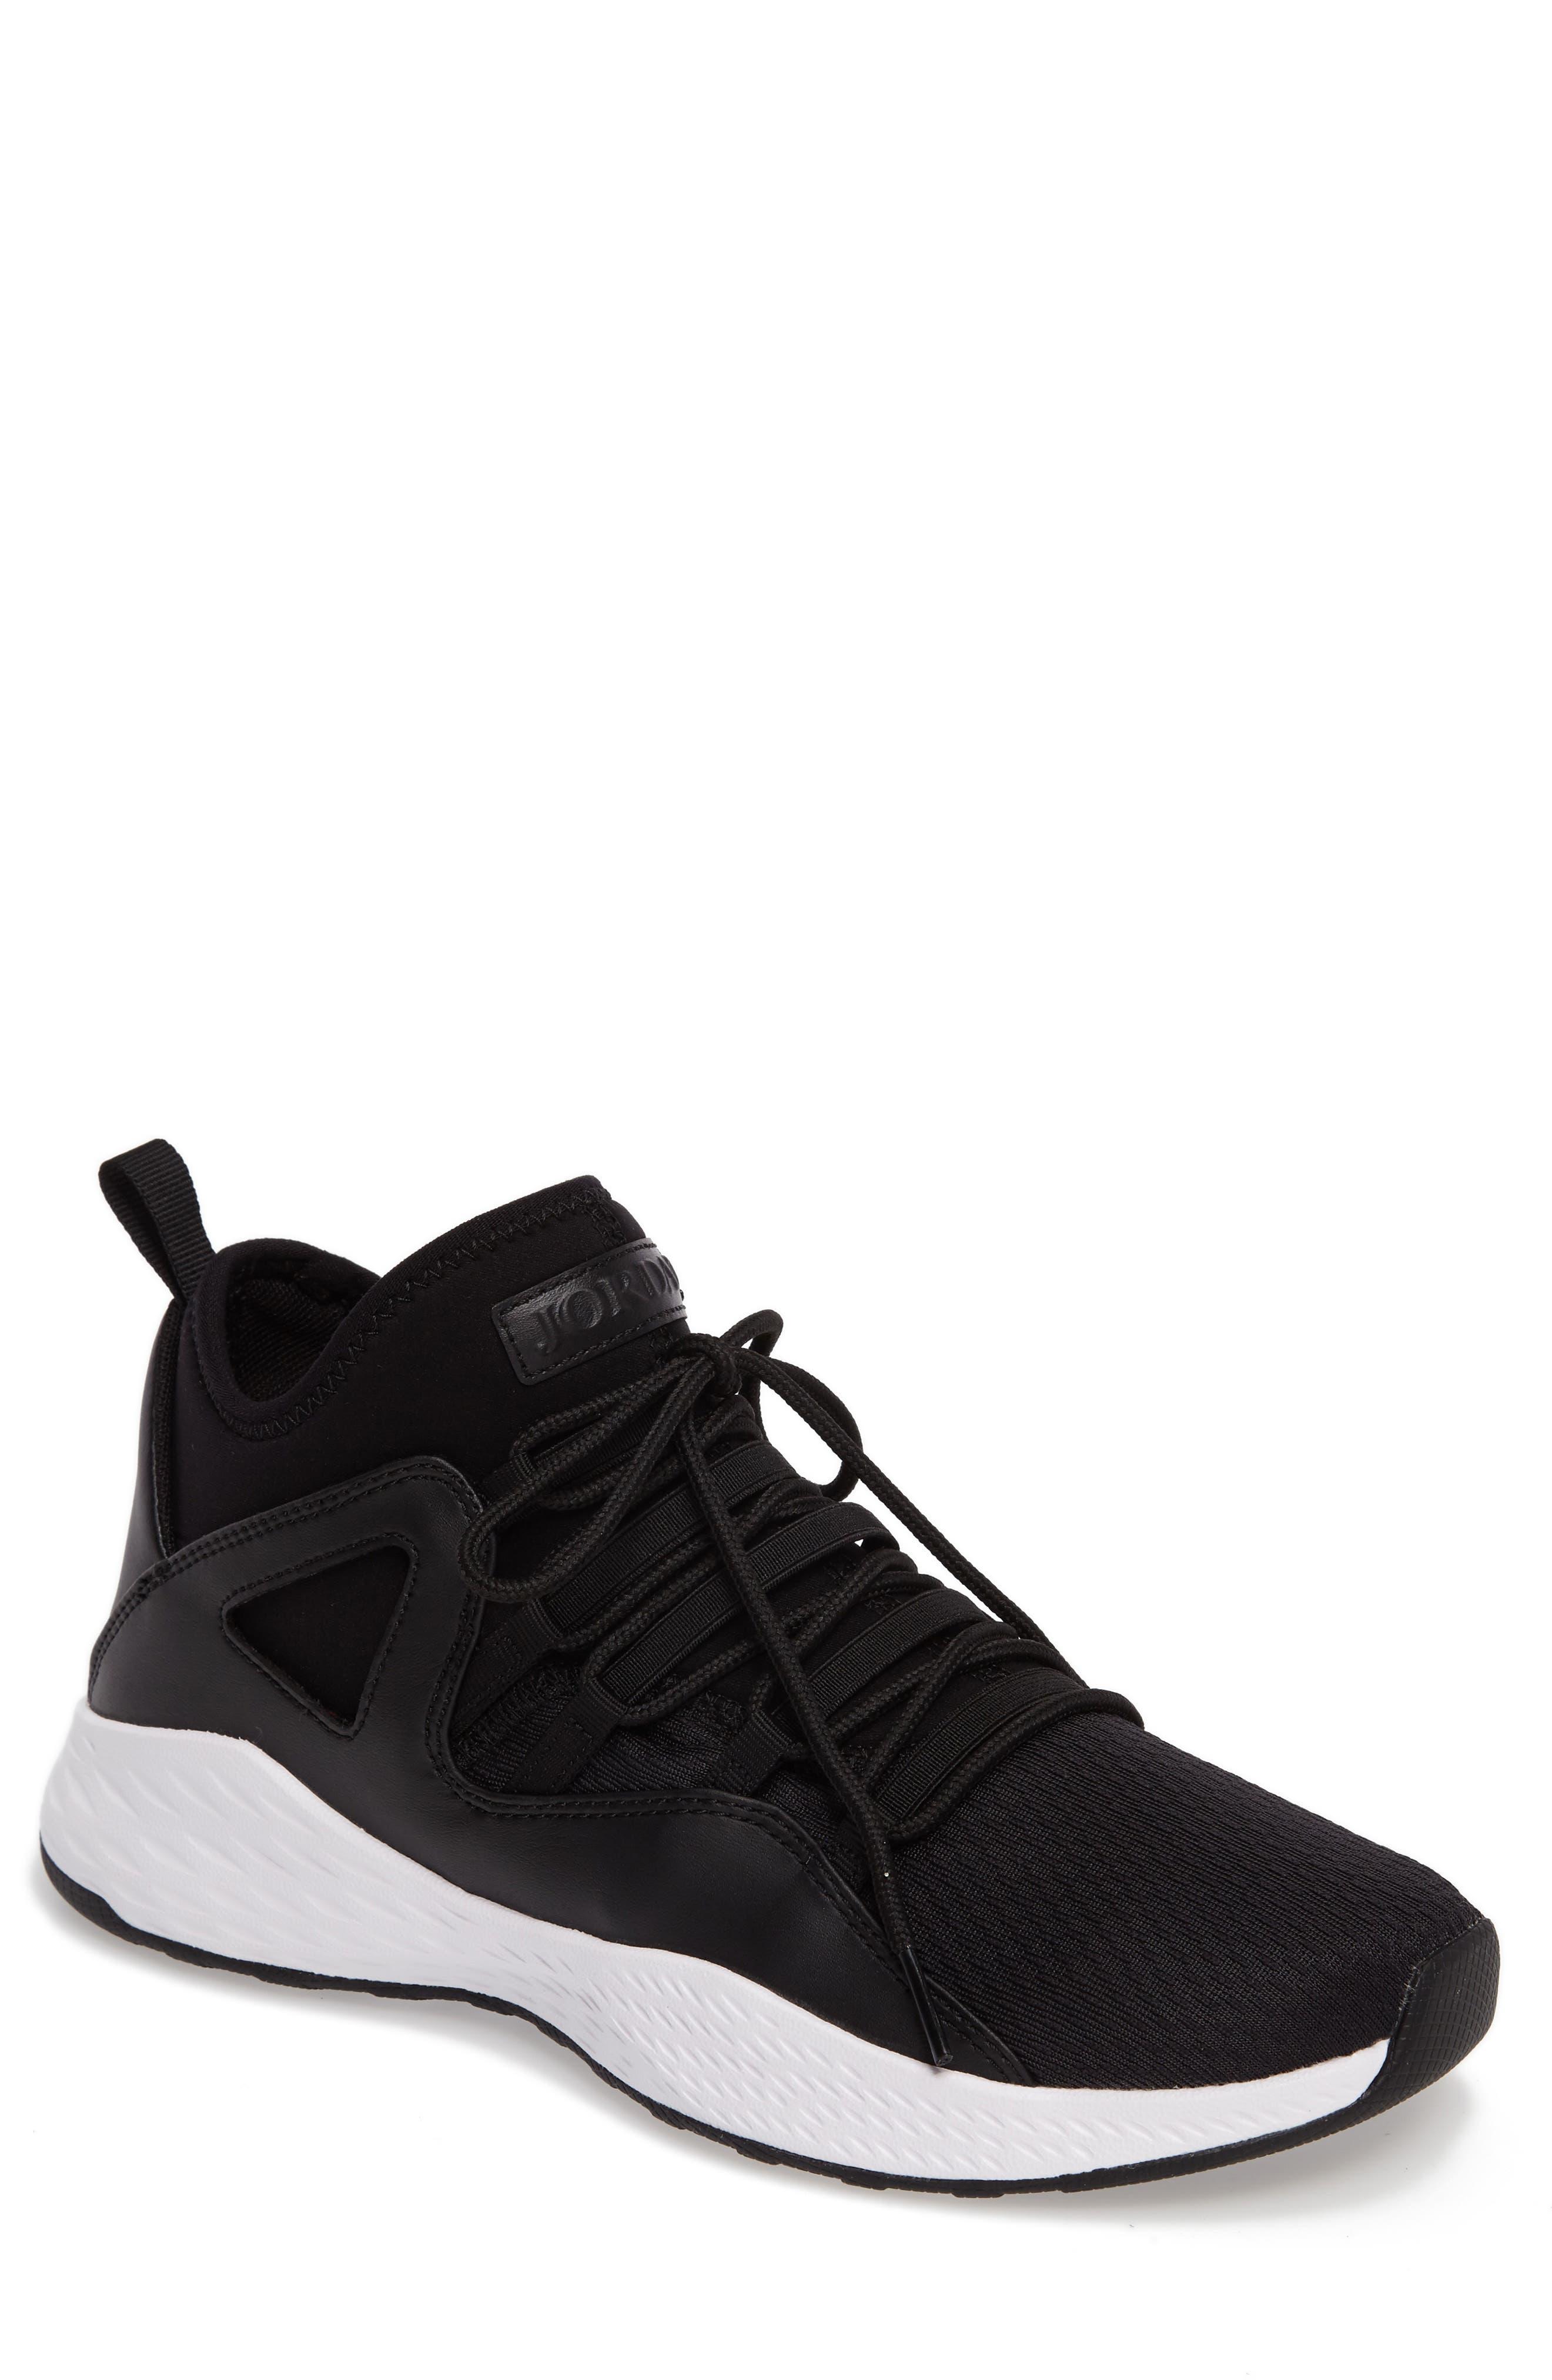 NIKE Jordan Formula 23 Basketball Shoe